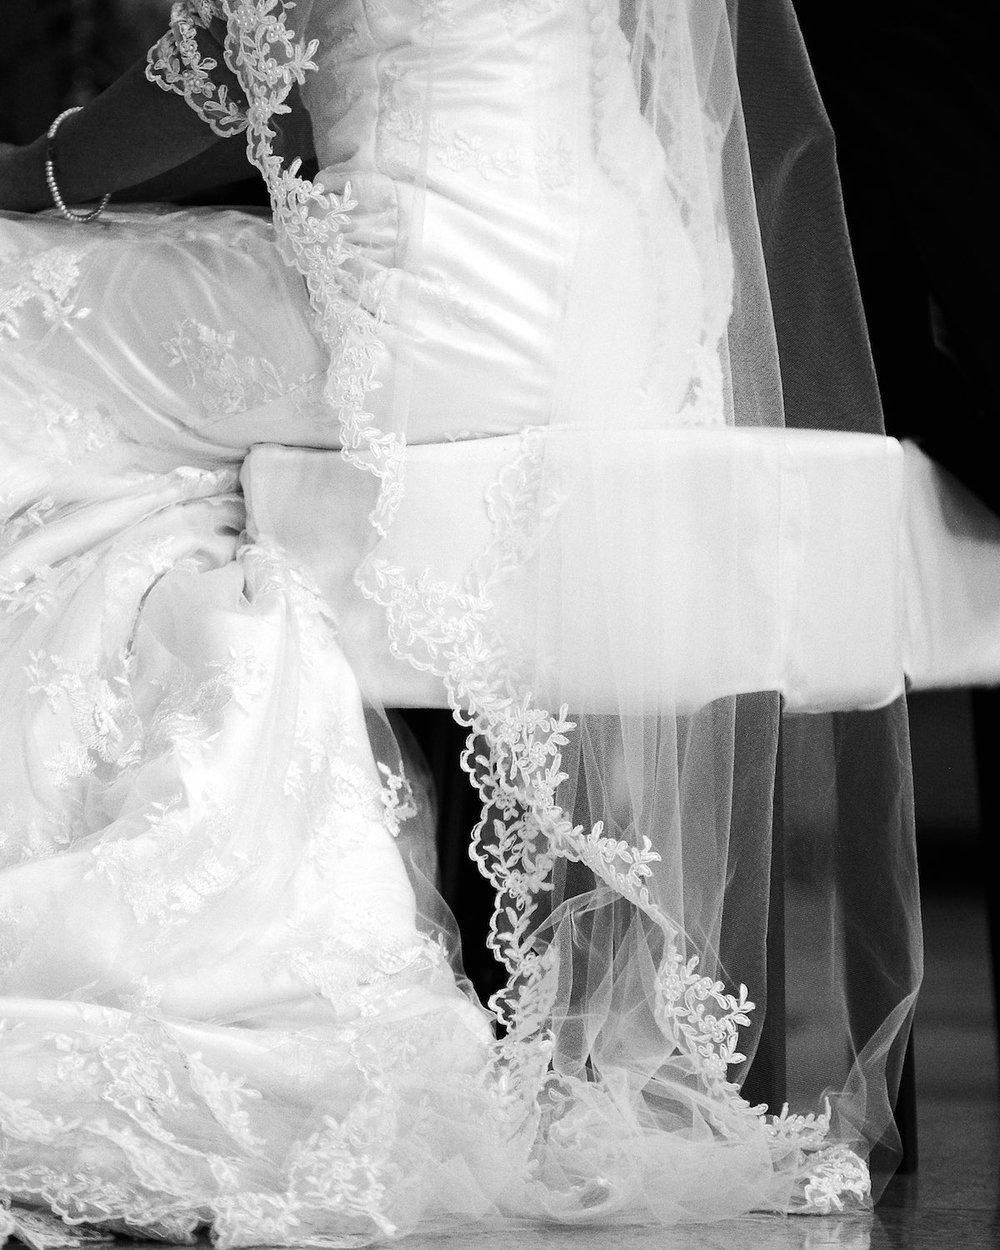 oc-wedding-michal-pfeil-17.jpg